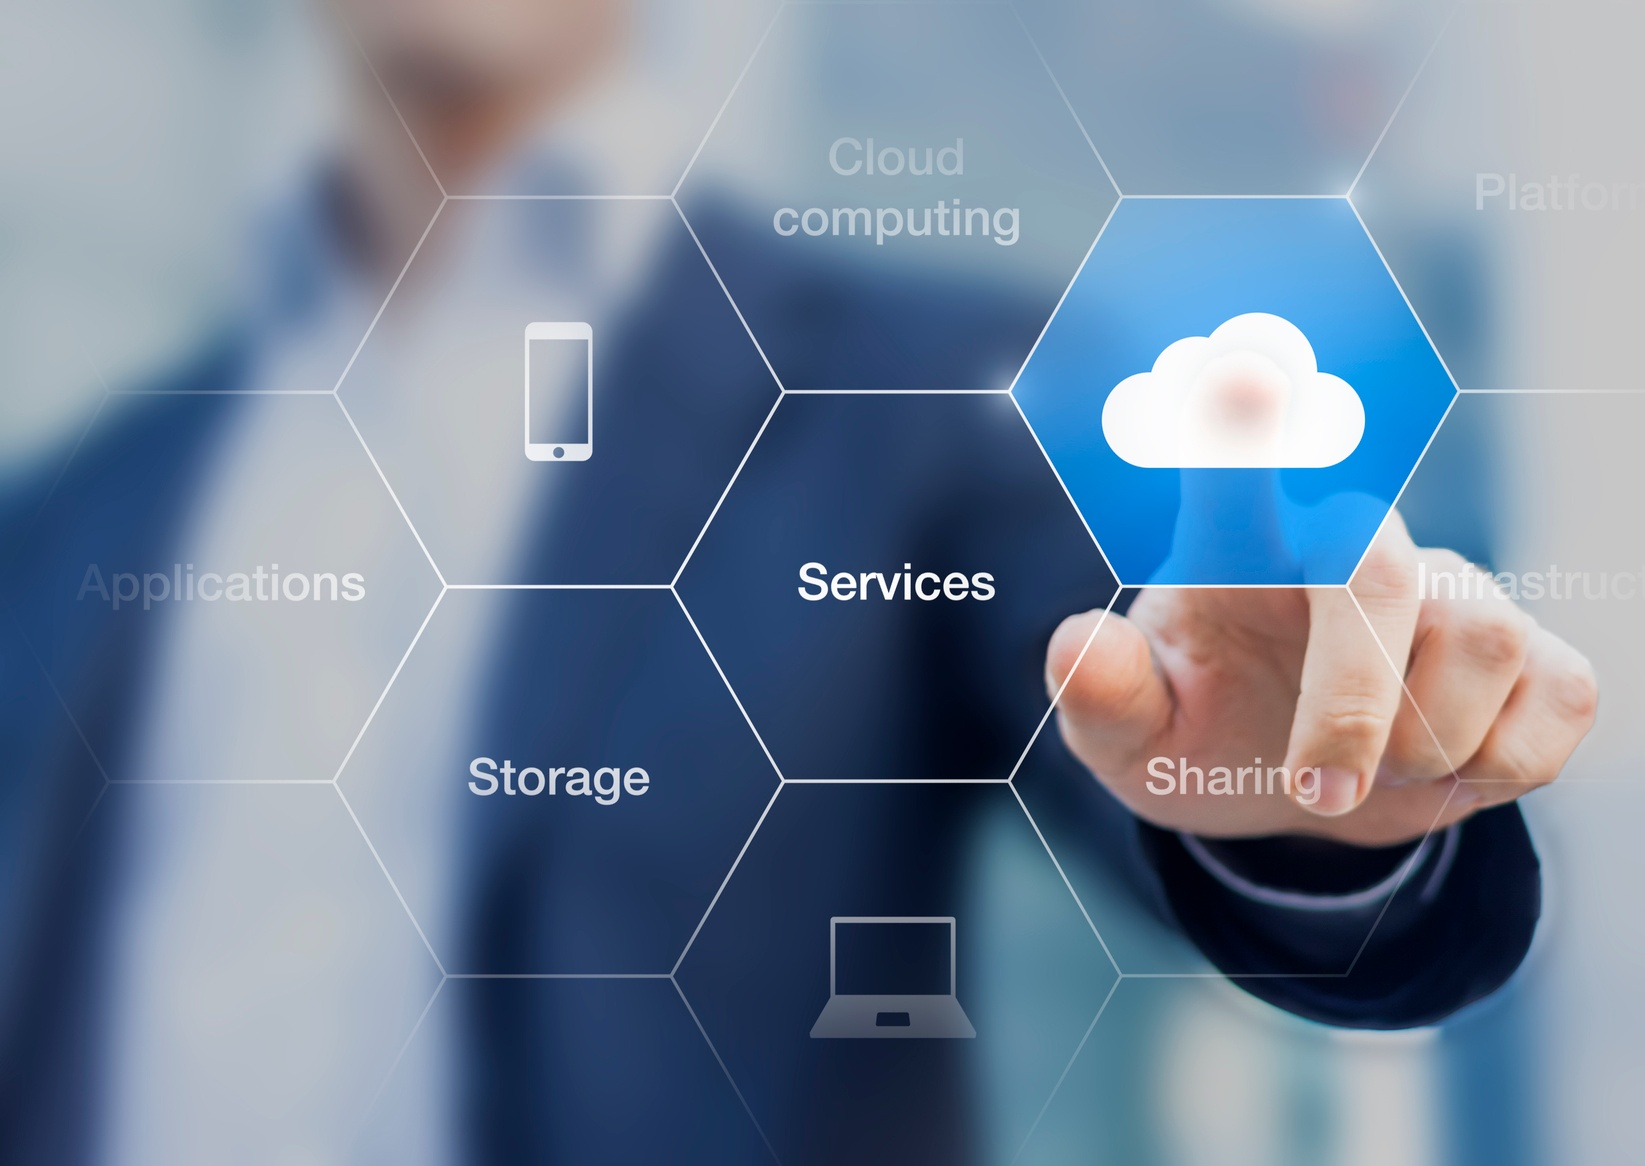 Concept-about-cloud-computing-applications-storage-services-online-000090736045_Medium.jpg